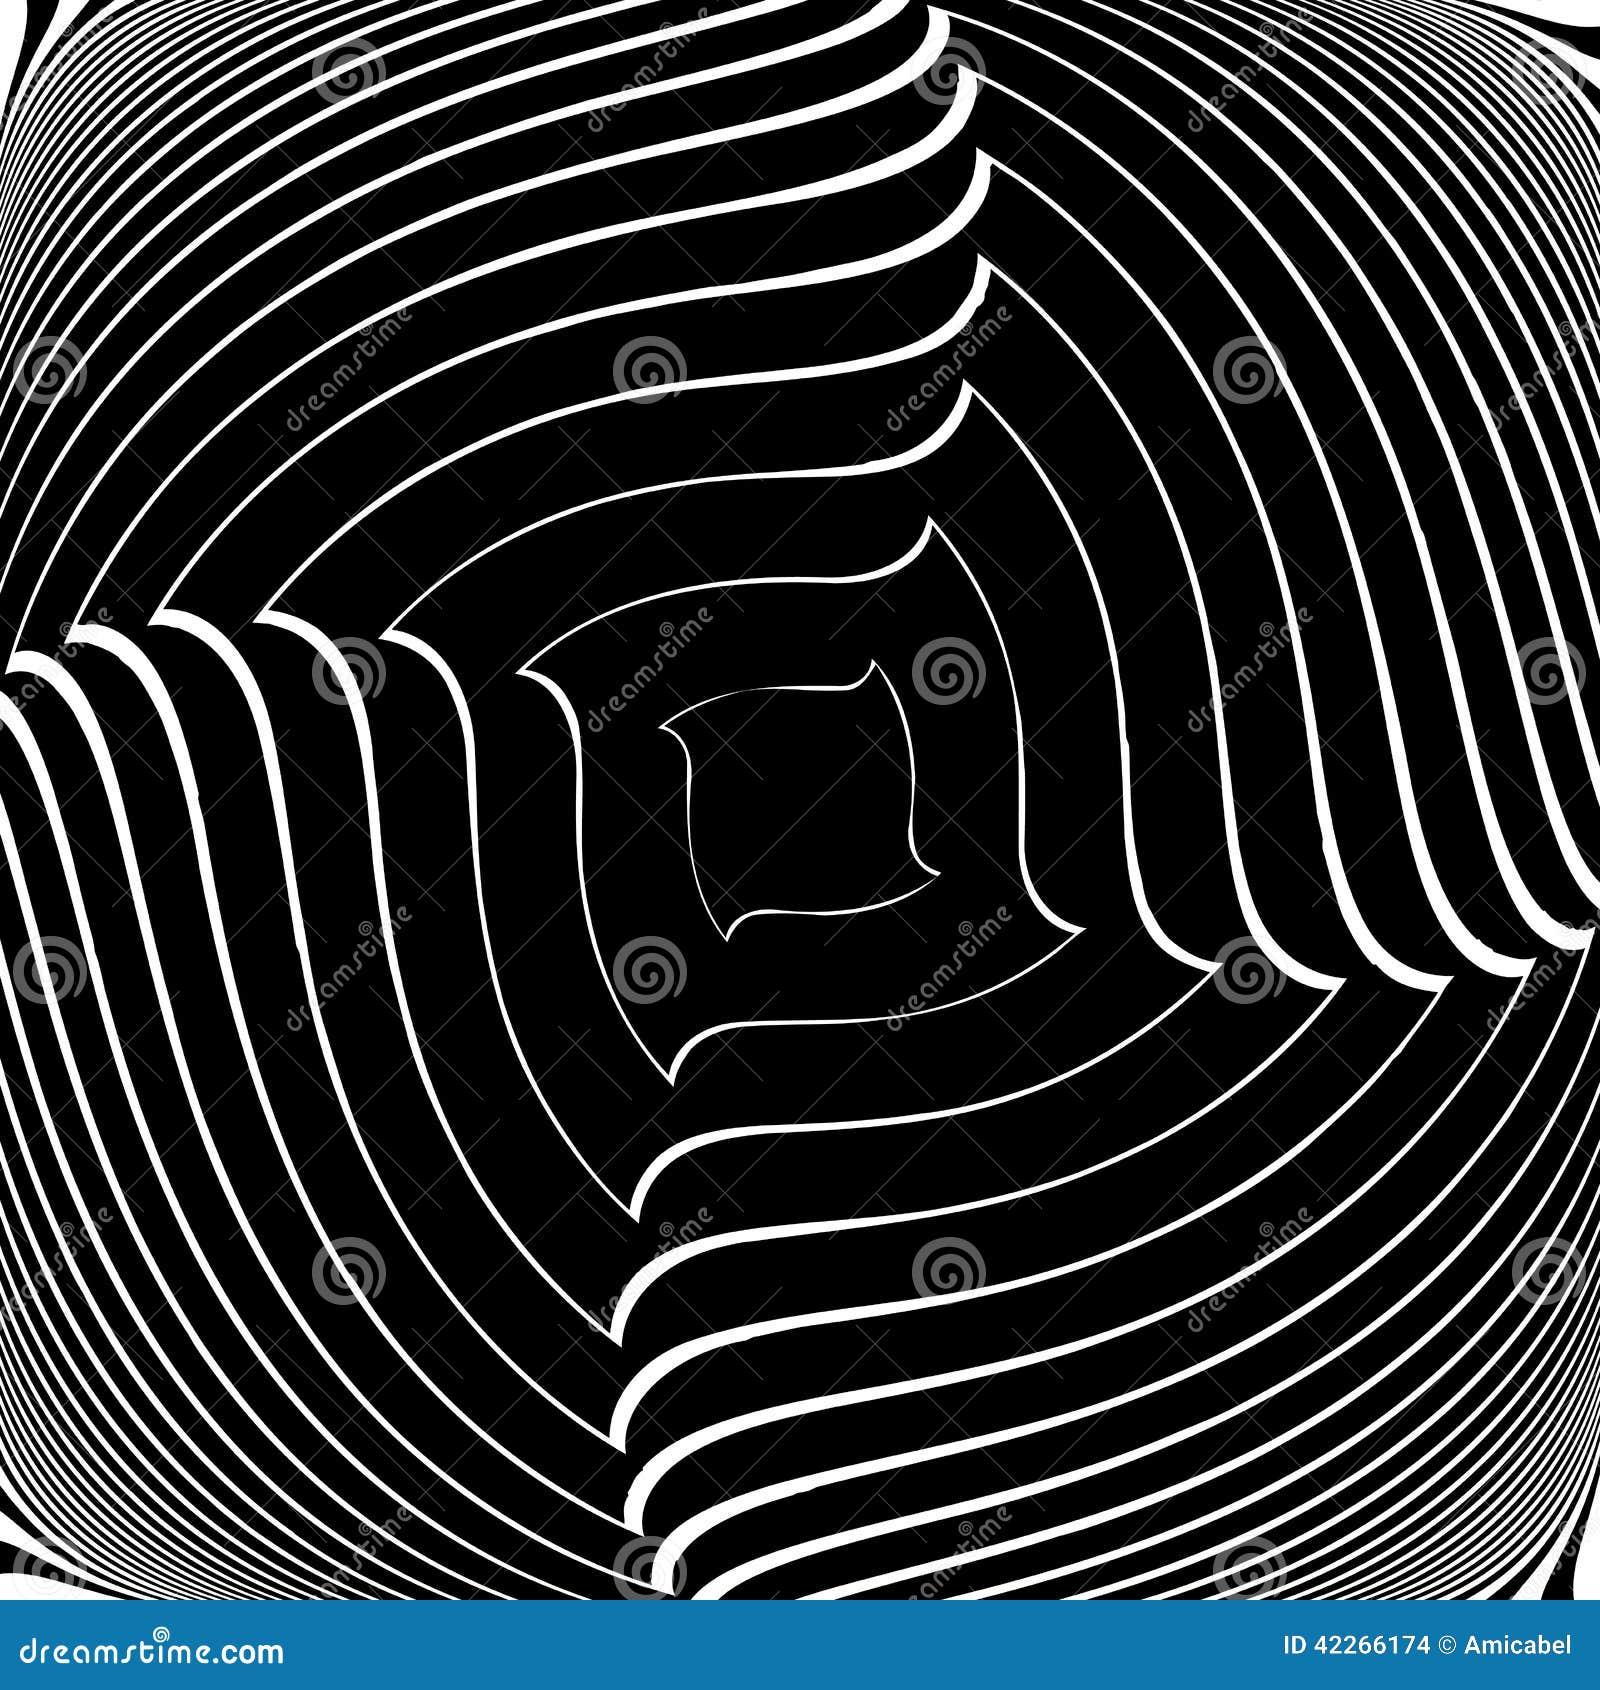 Design Monochrome Vortex Illusion Background Stock Vector